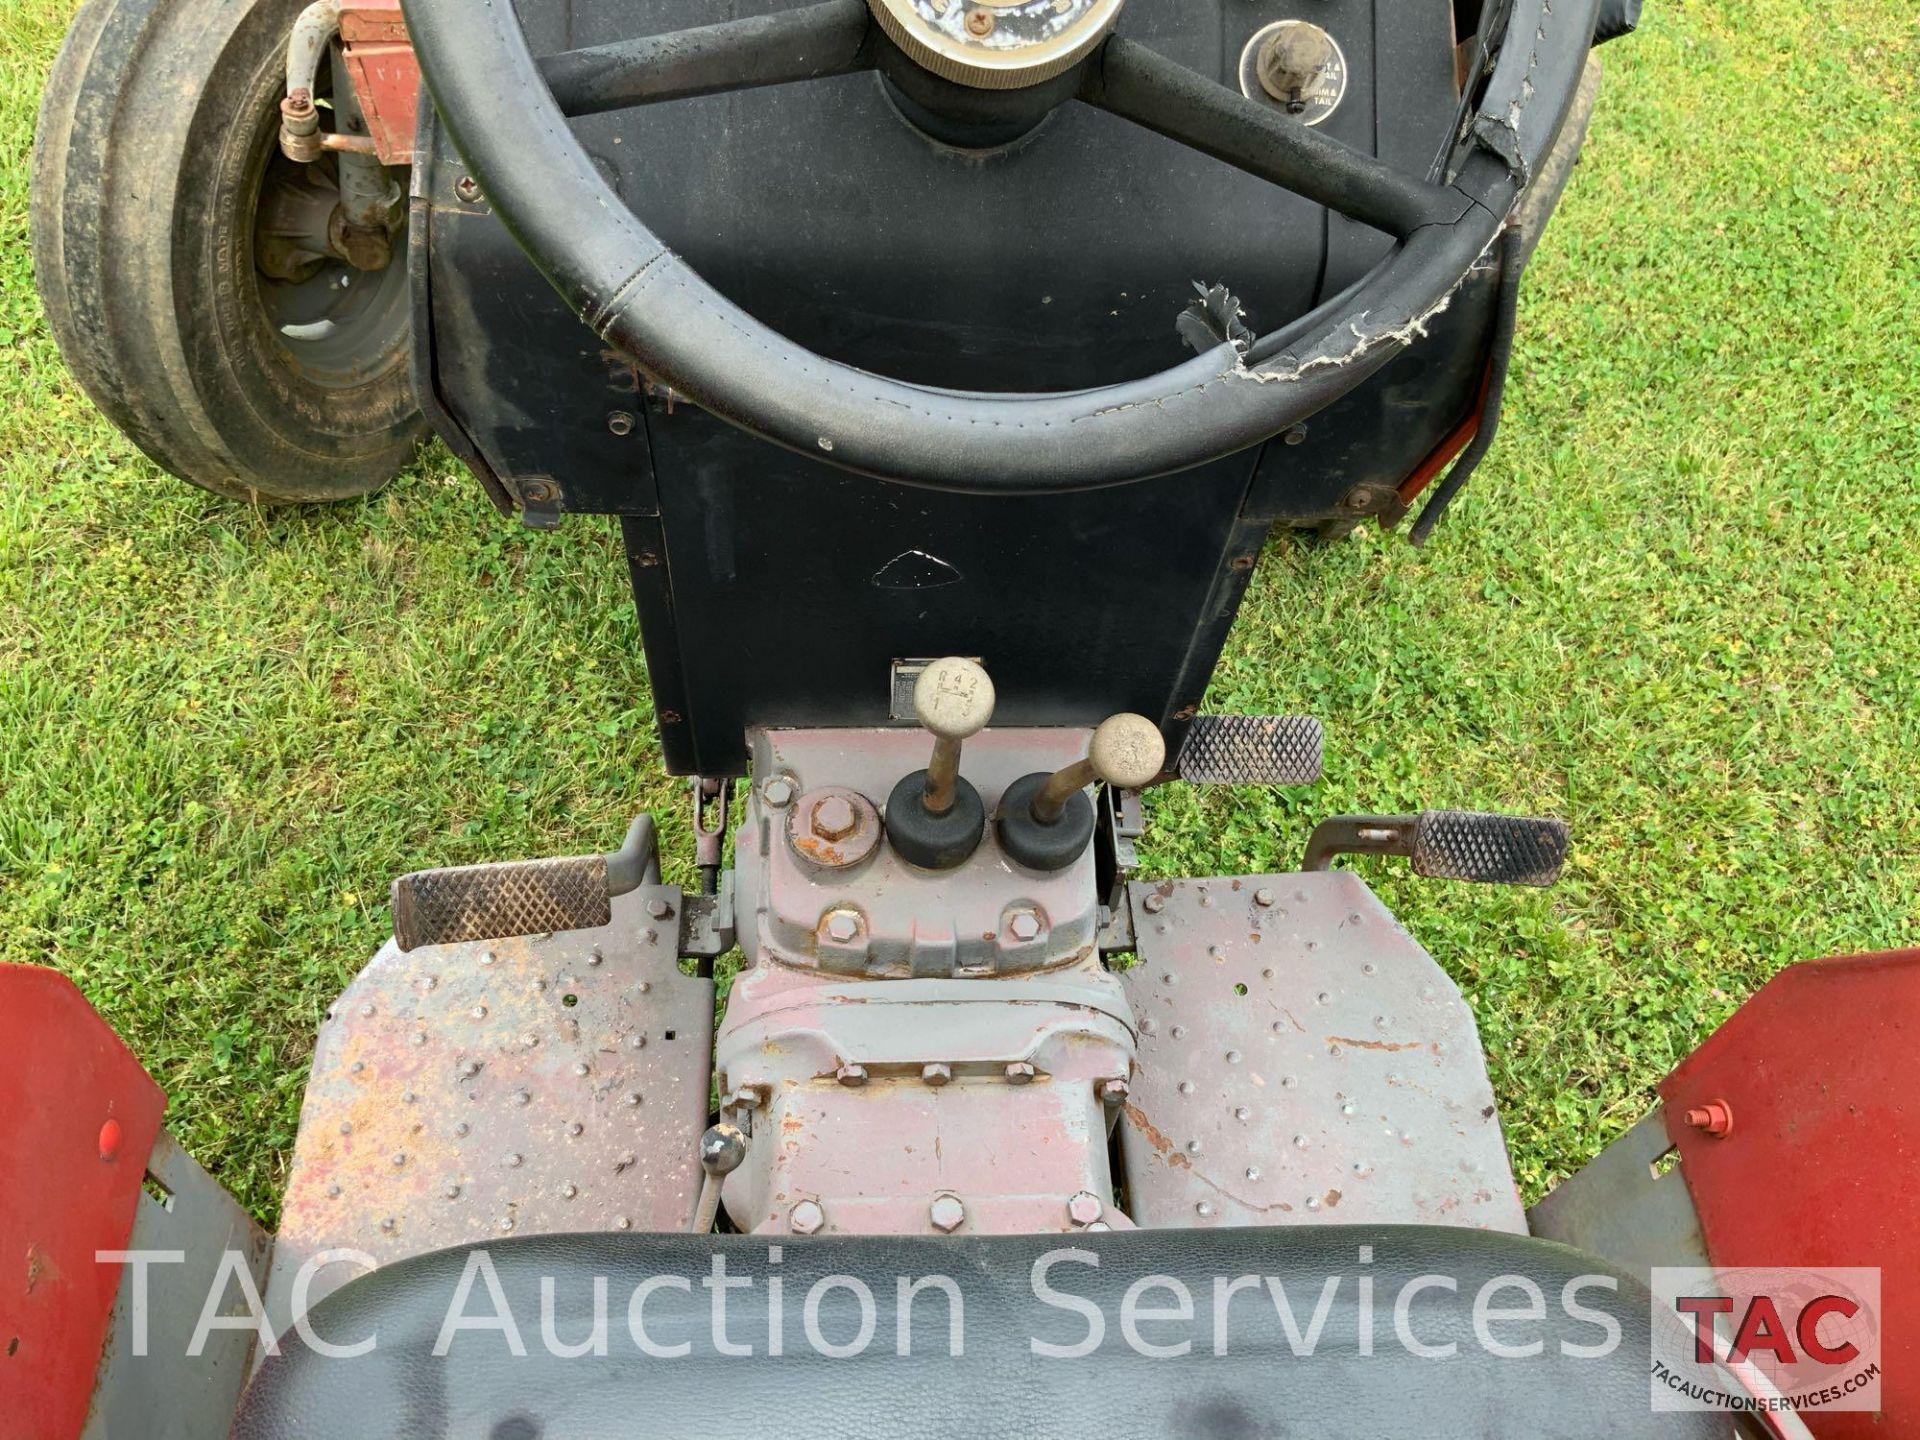 Massey Ferguson 275 Farm Tractor - Image 15 of 25